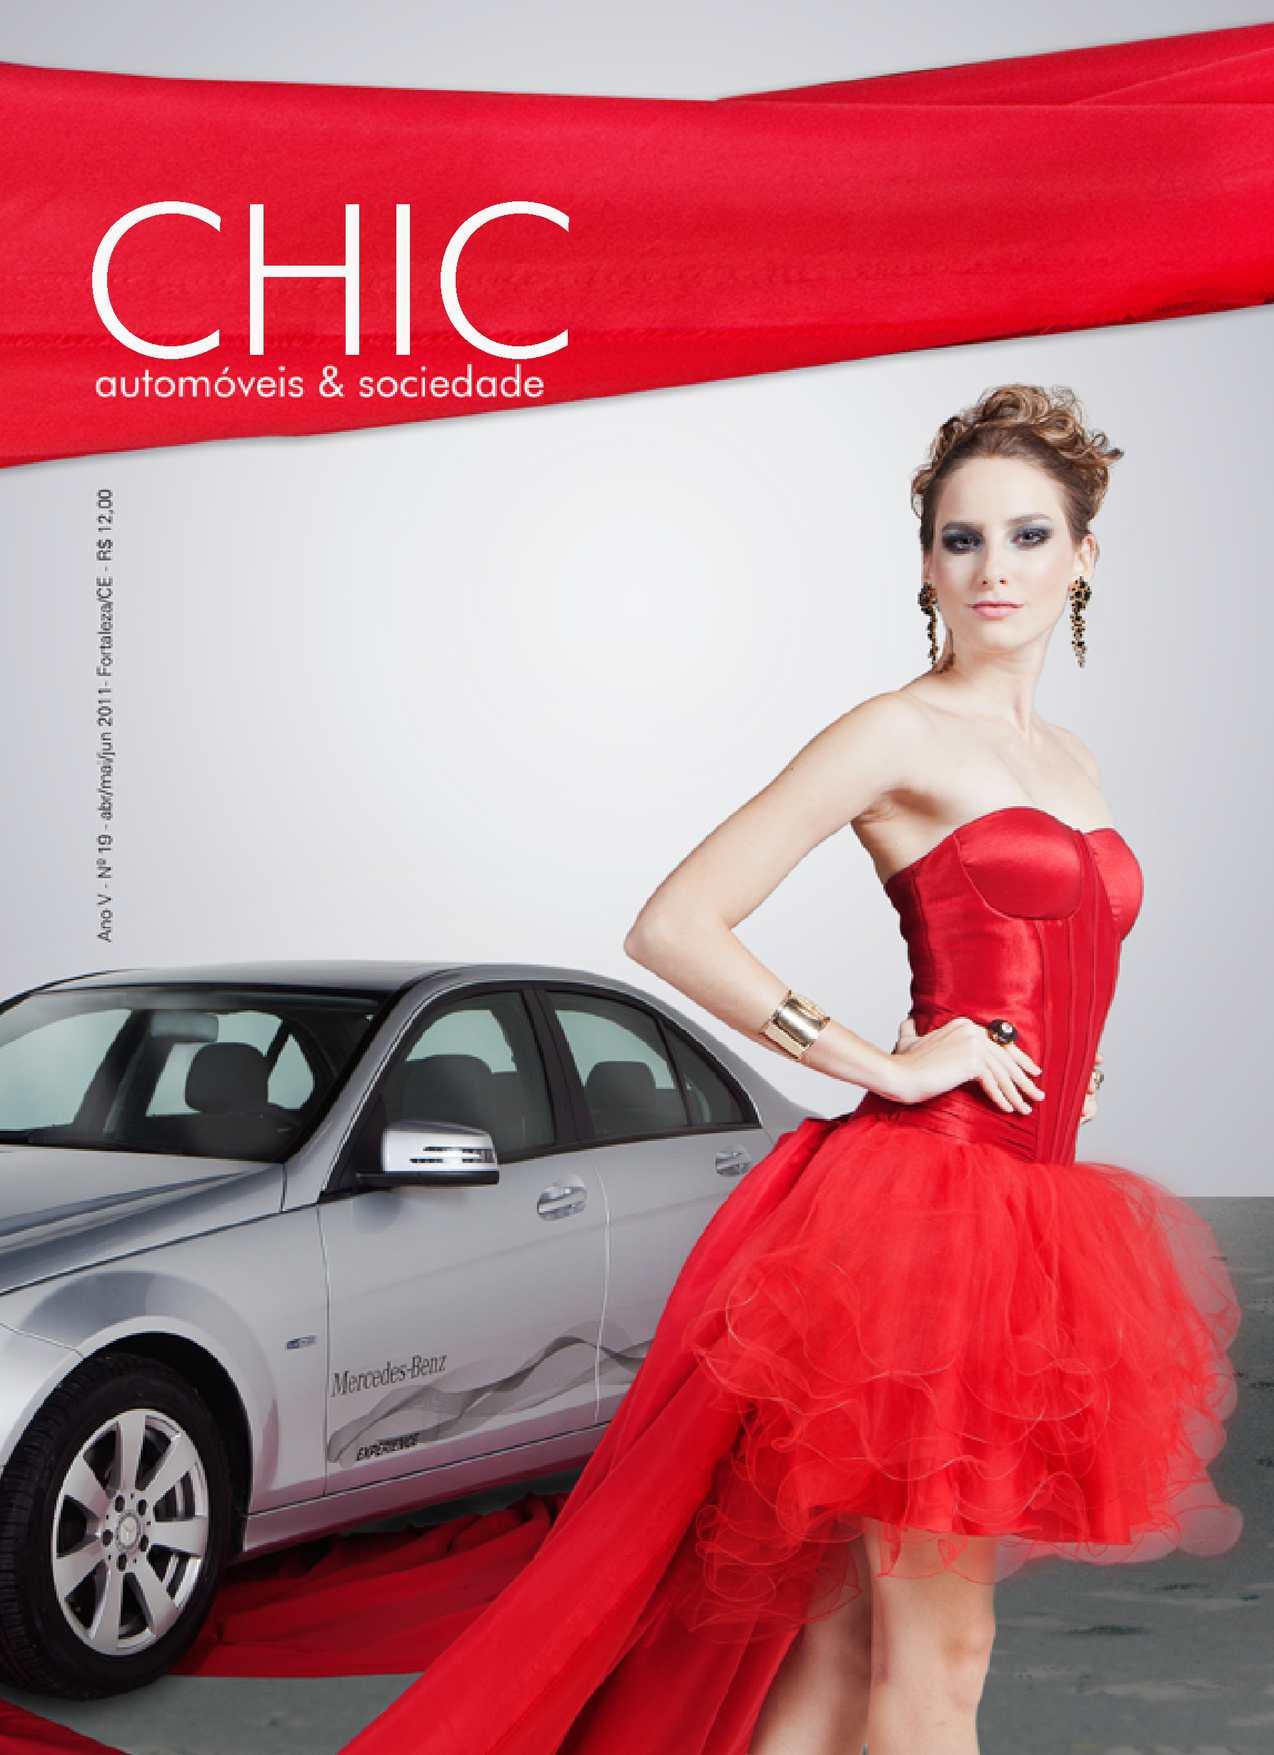 be09c69d90a14 Calaméo - Revista CHIC Automóveis   Sociedade n°19